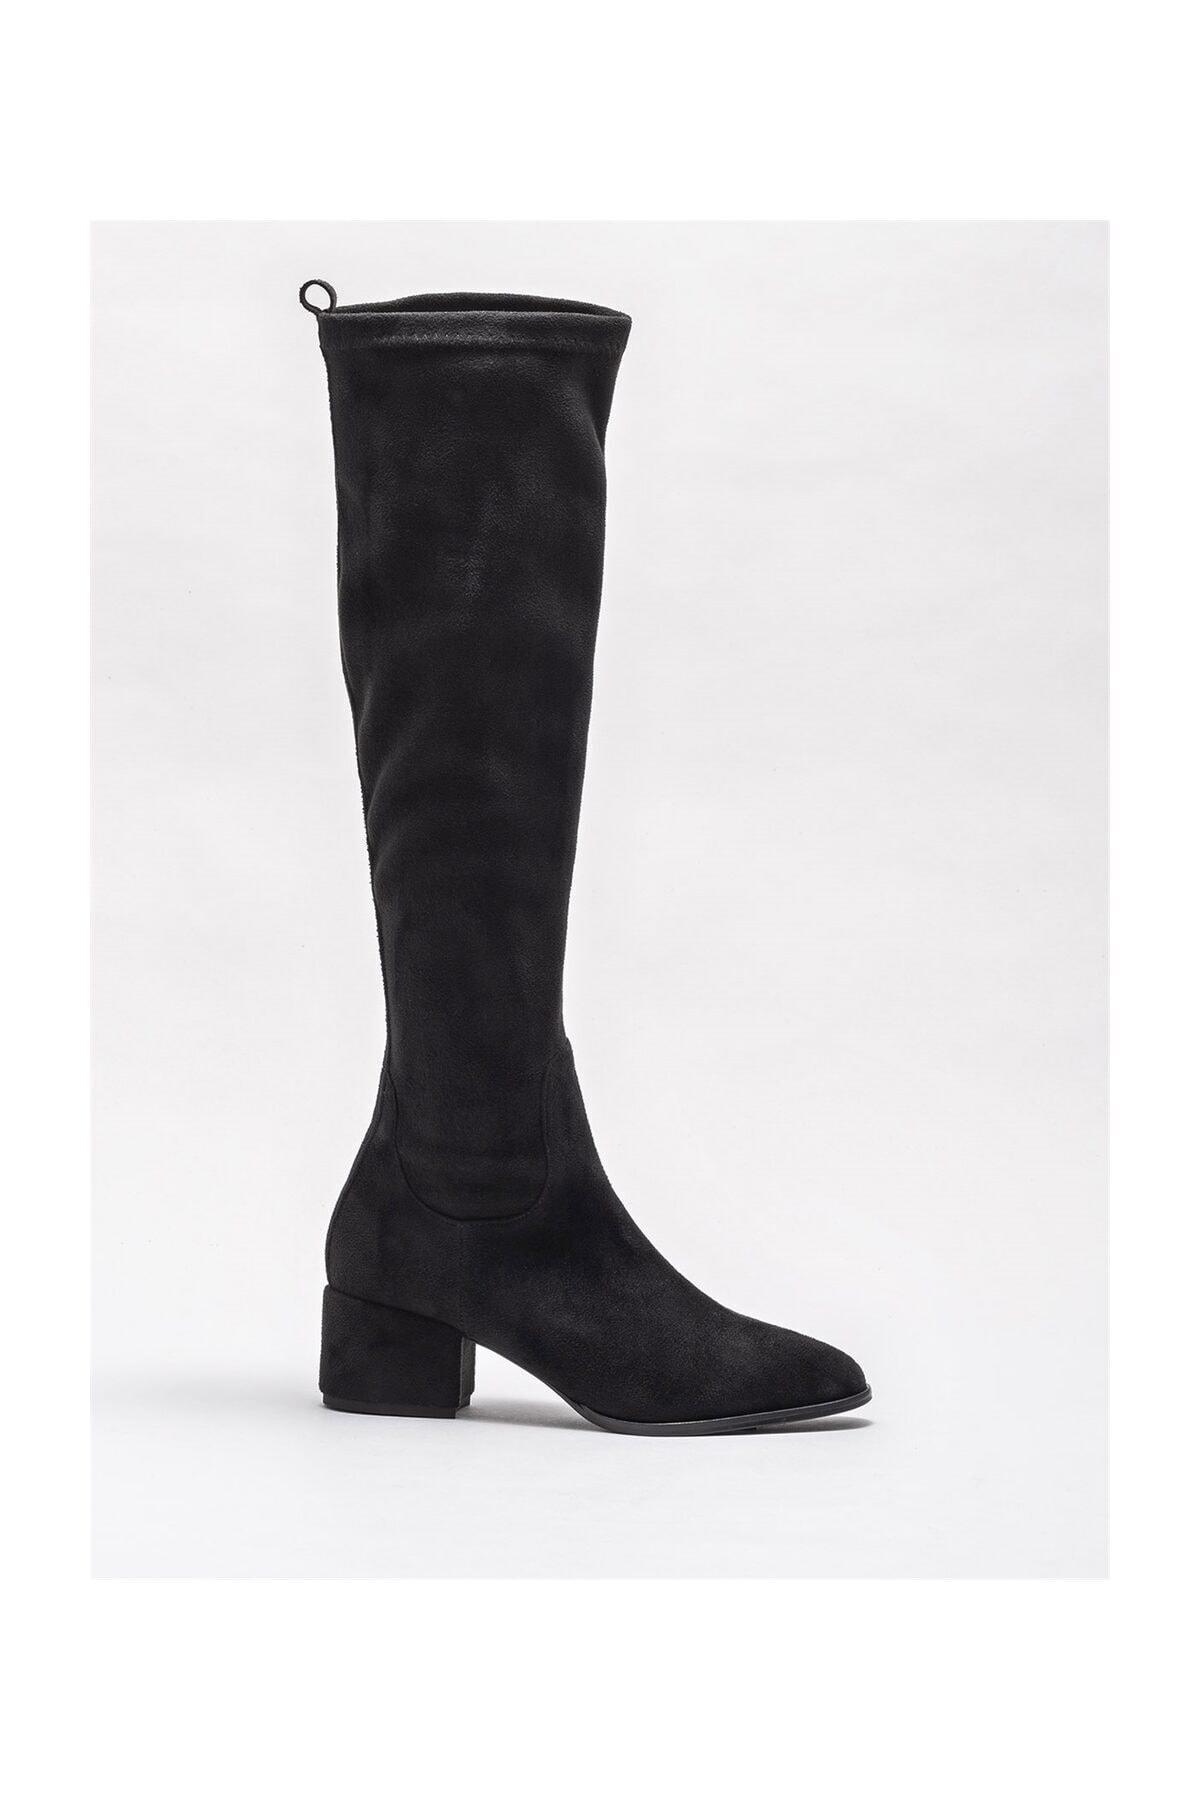 Elle Shoes Kadın Ravendra Sıyah Çizme 20KTO34102 1